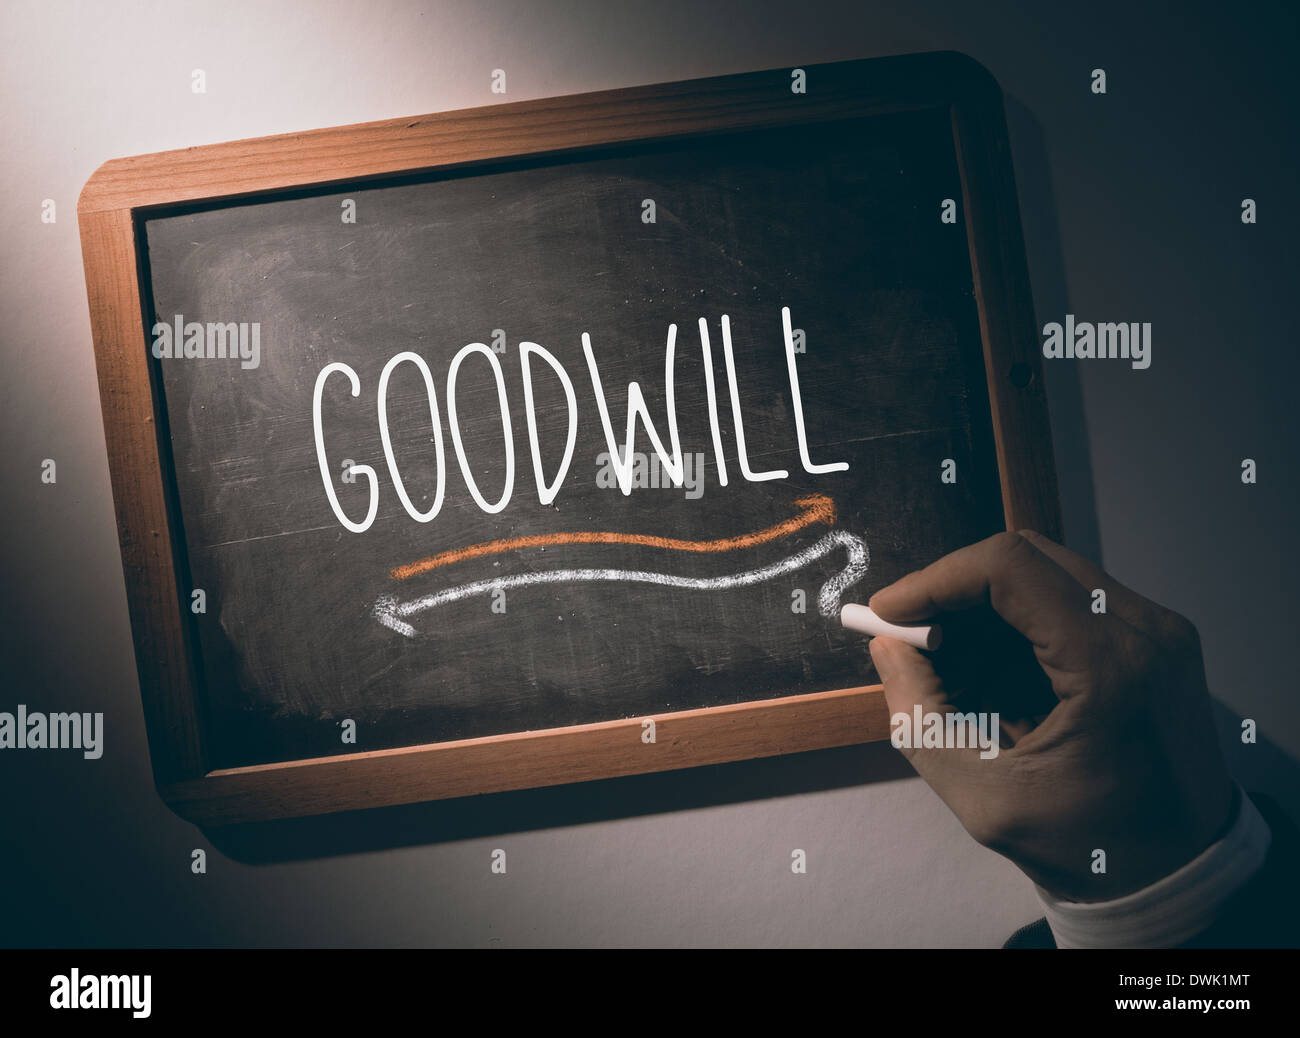 Hand writing Goodwill on chalkboard - Stock Image